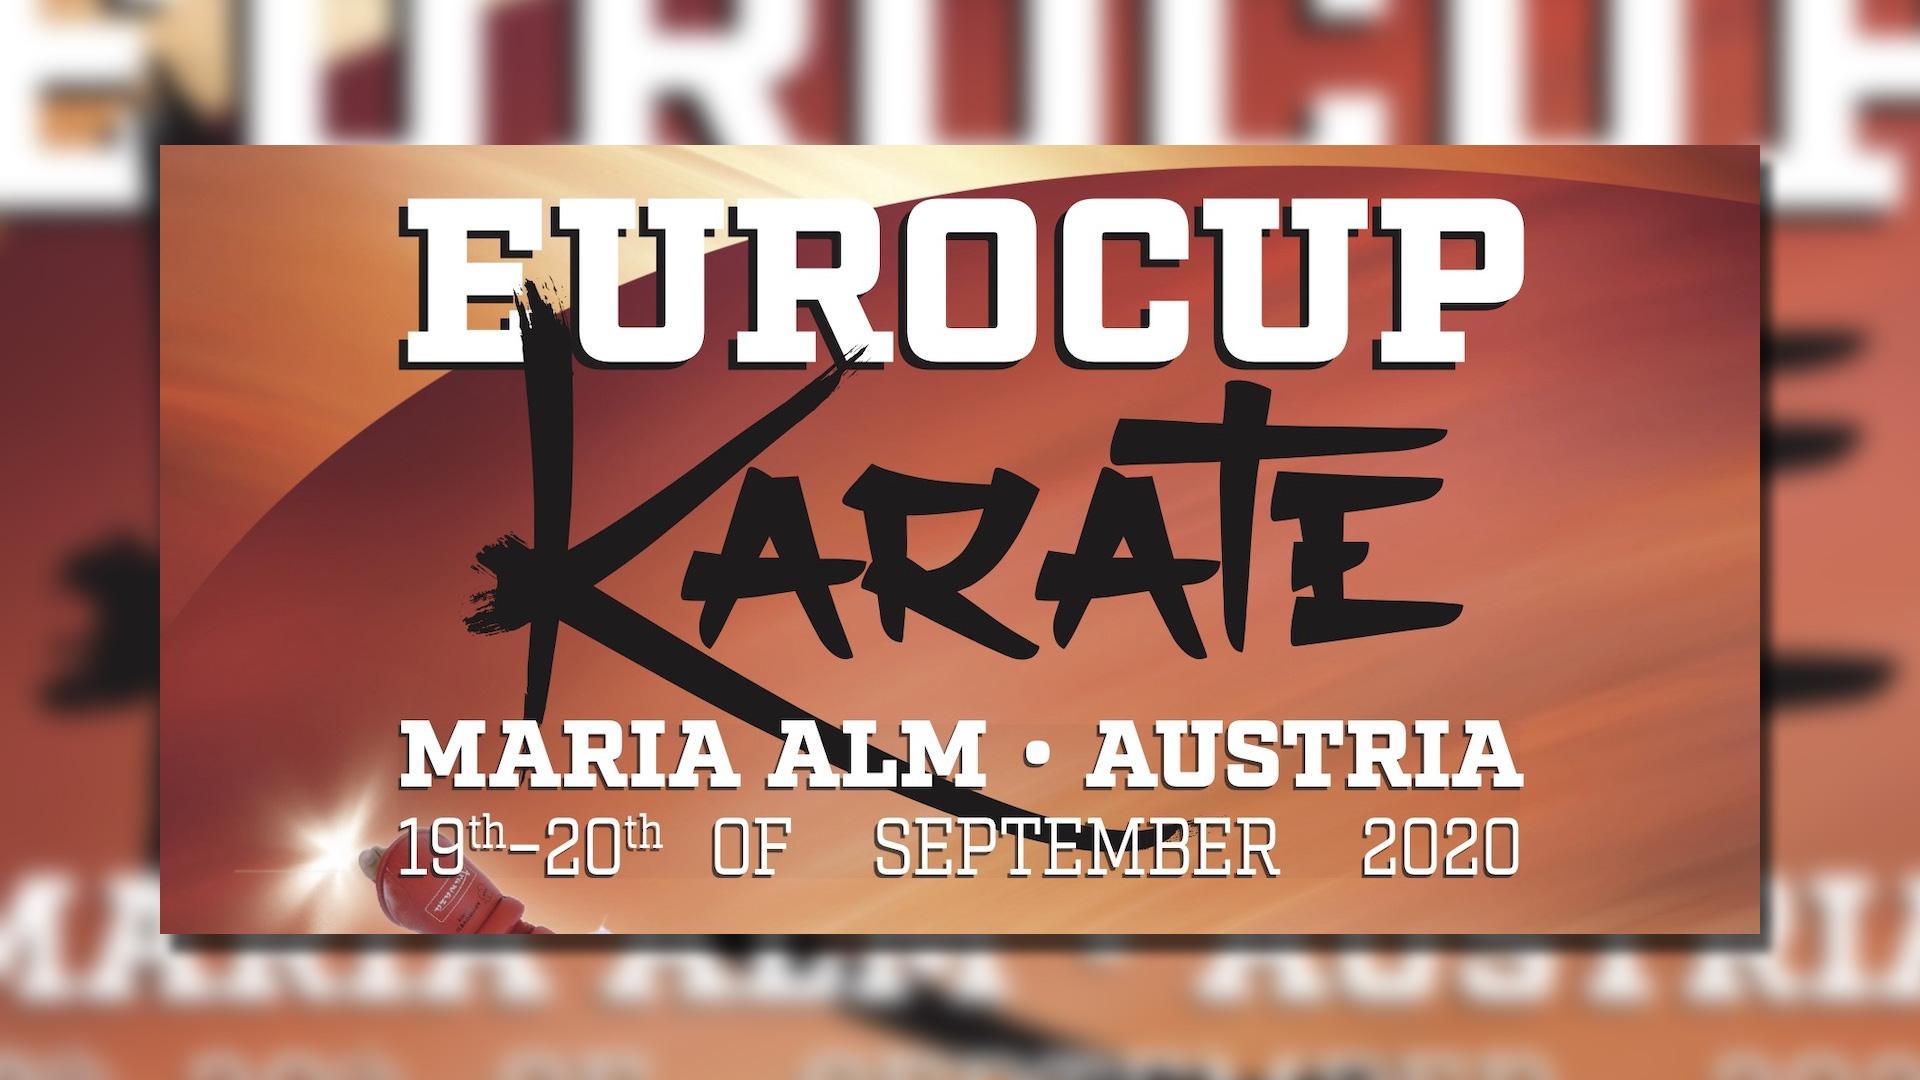 Euro Cup 2020 Karate Plakat am 19. und 20. September 2020 in Maria Alm